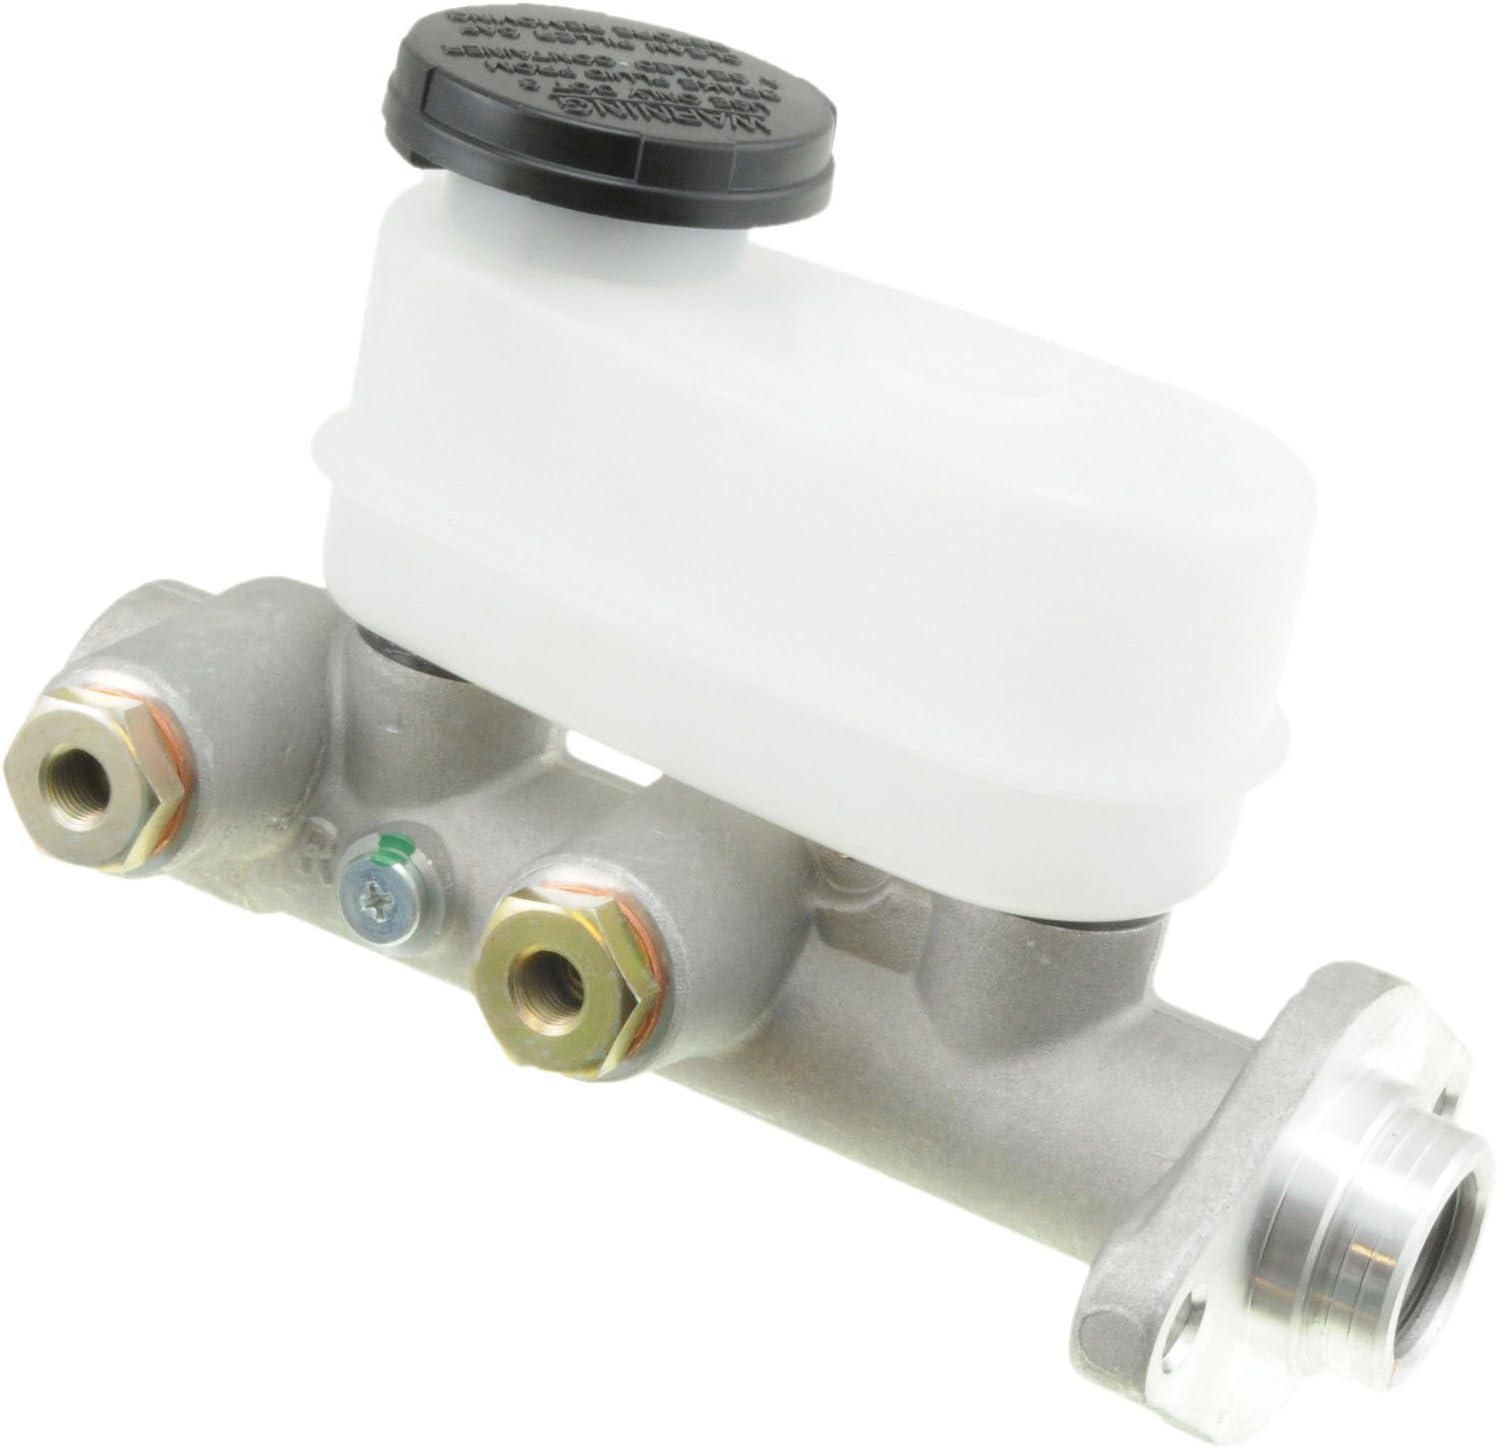 NAMCCO Brake Master Cylinder for Suzuki Grand Vitara MC390537